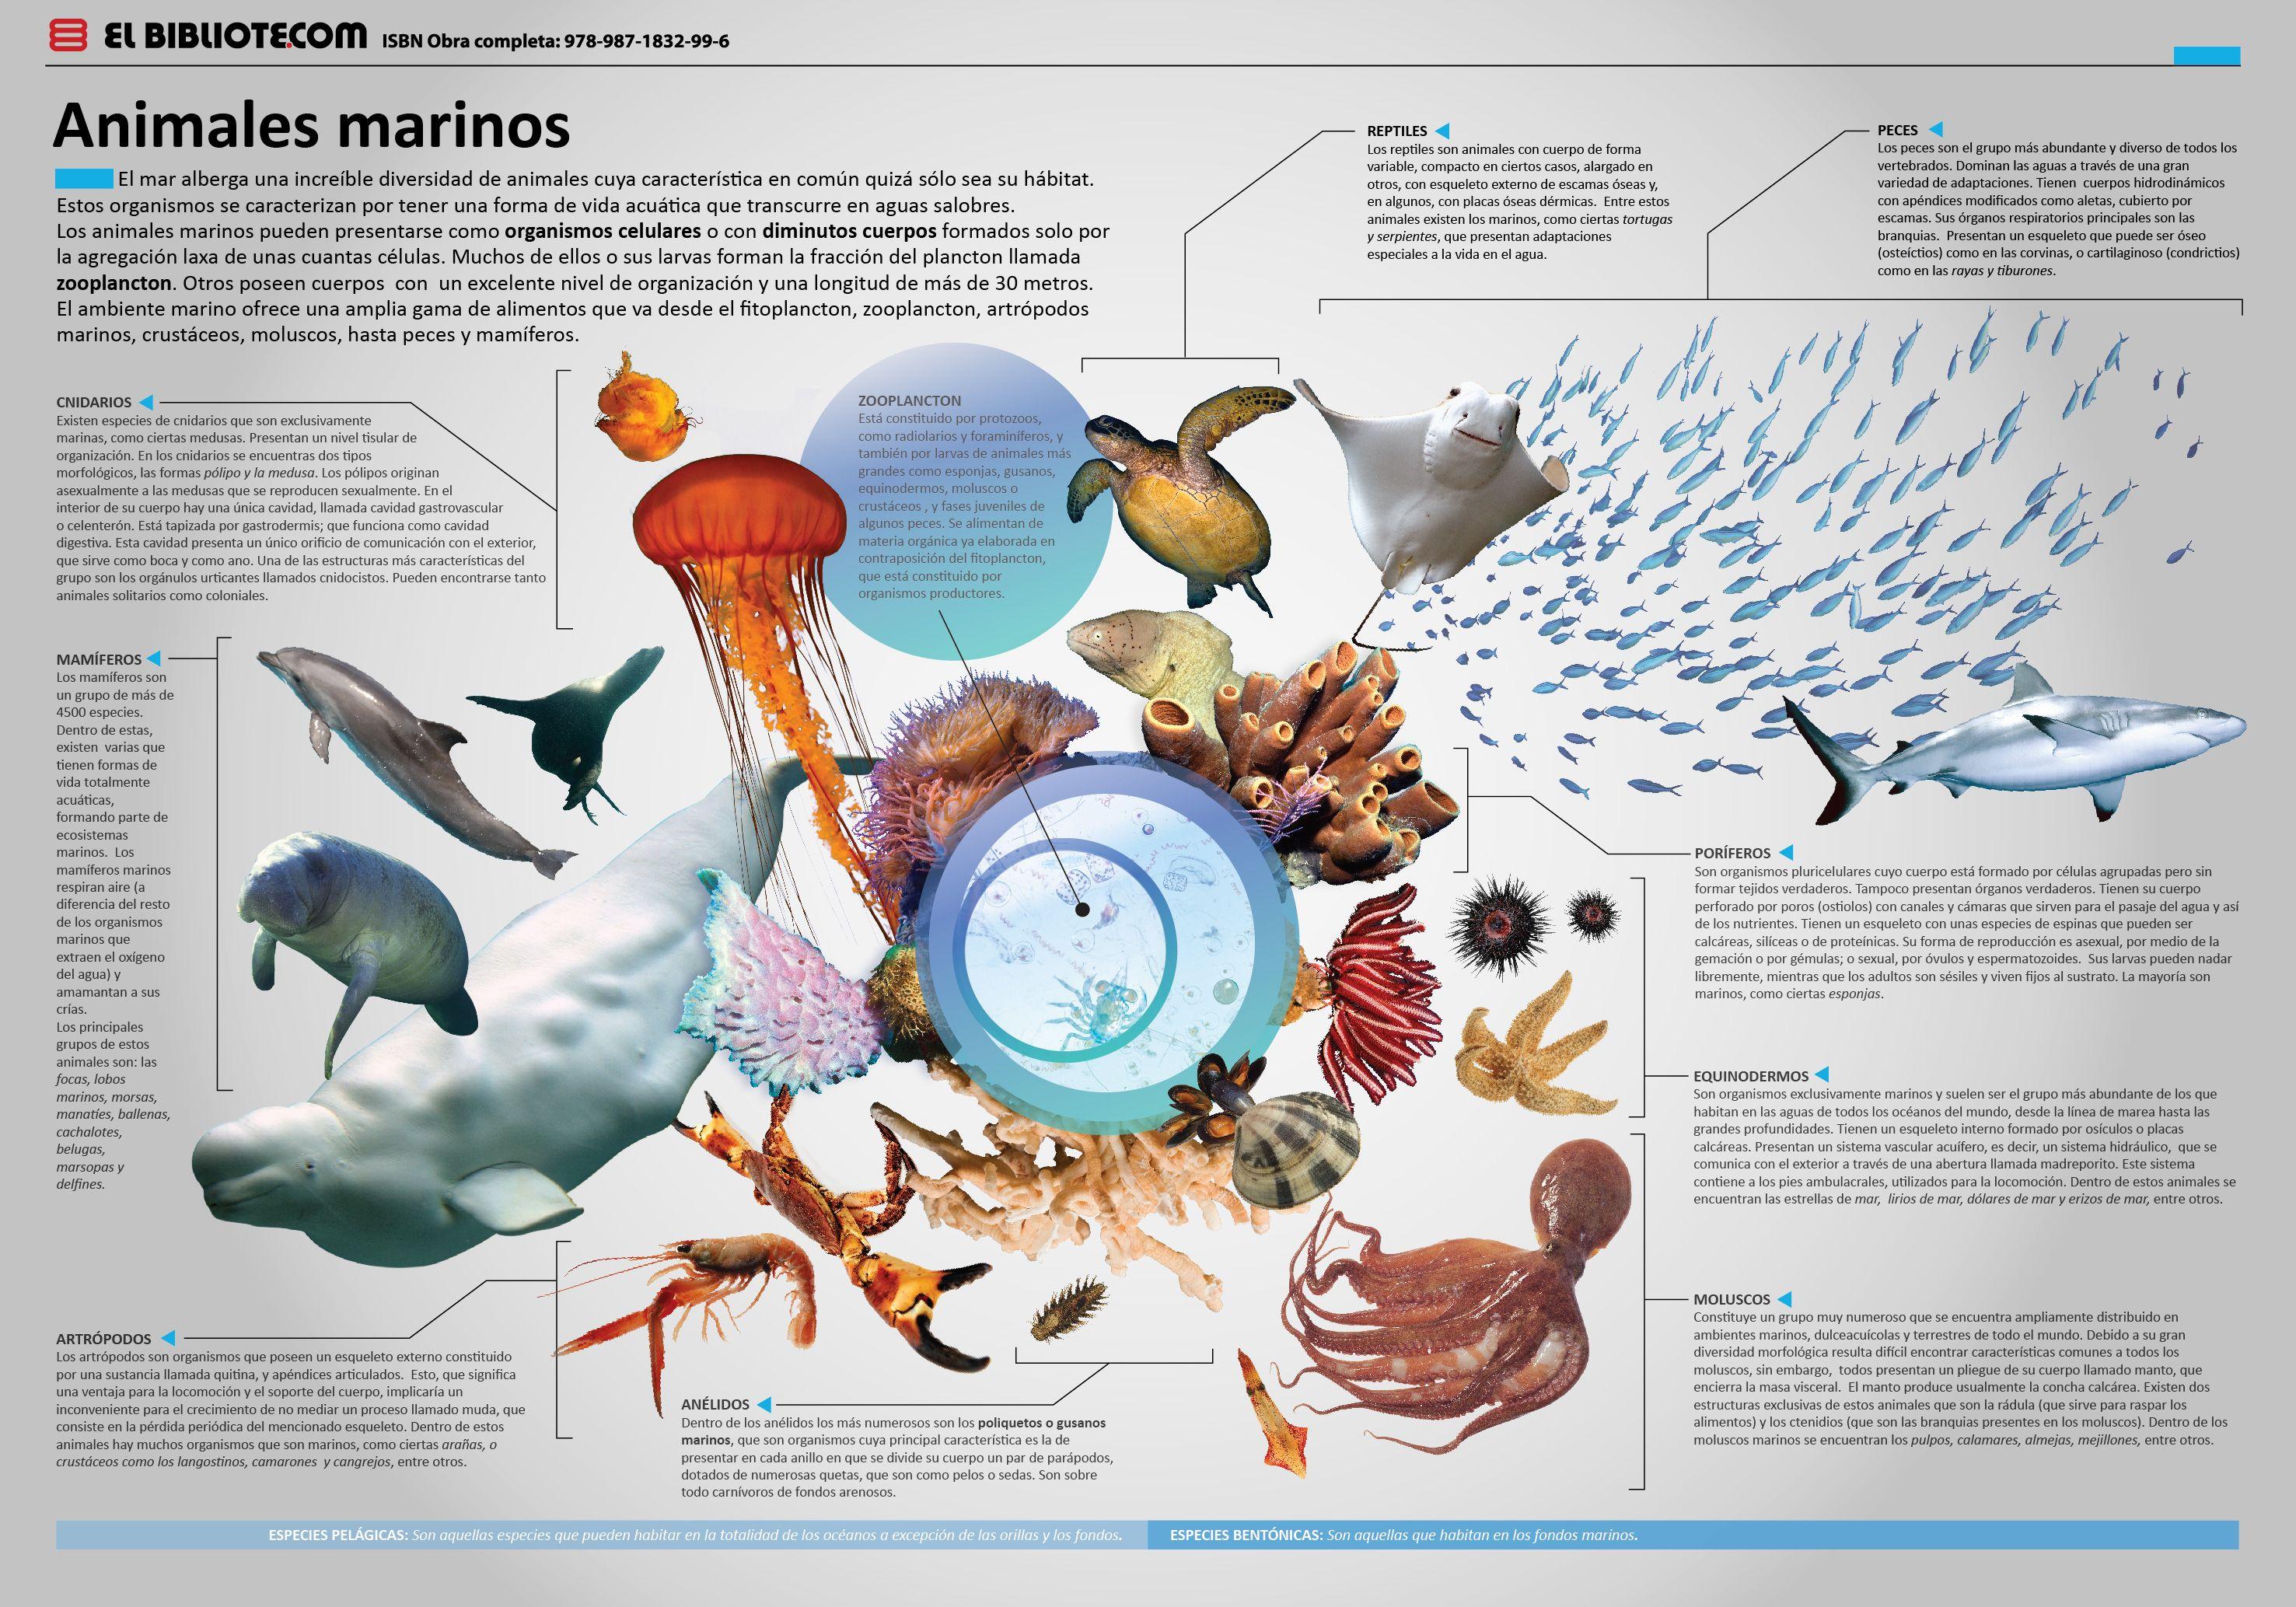 Pin By виктор пономаренко On Ciencia Naturaleza Y Tecnología Animal Posters Placemat Design Animals